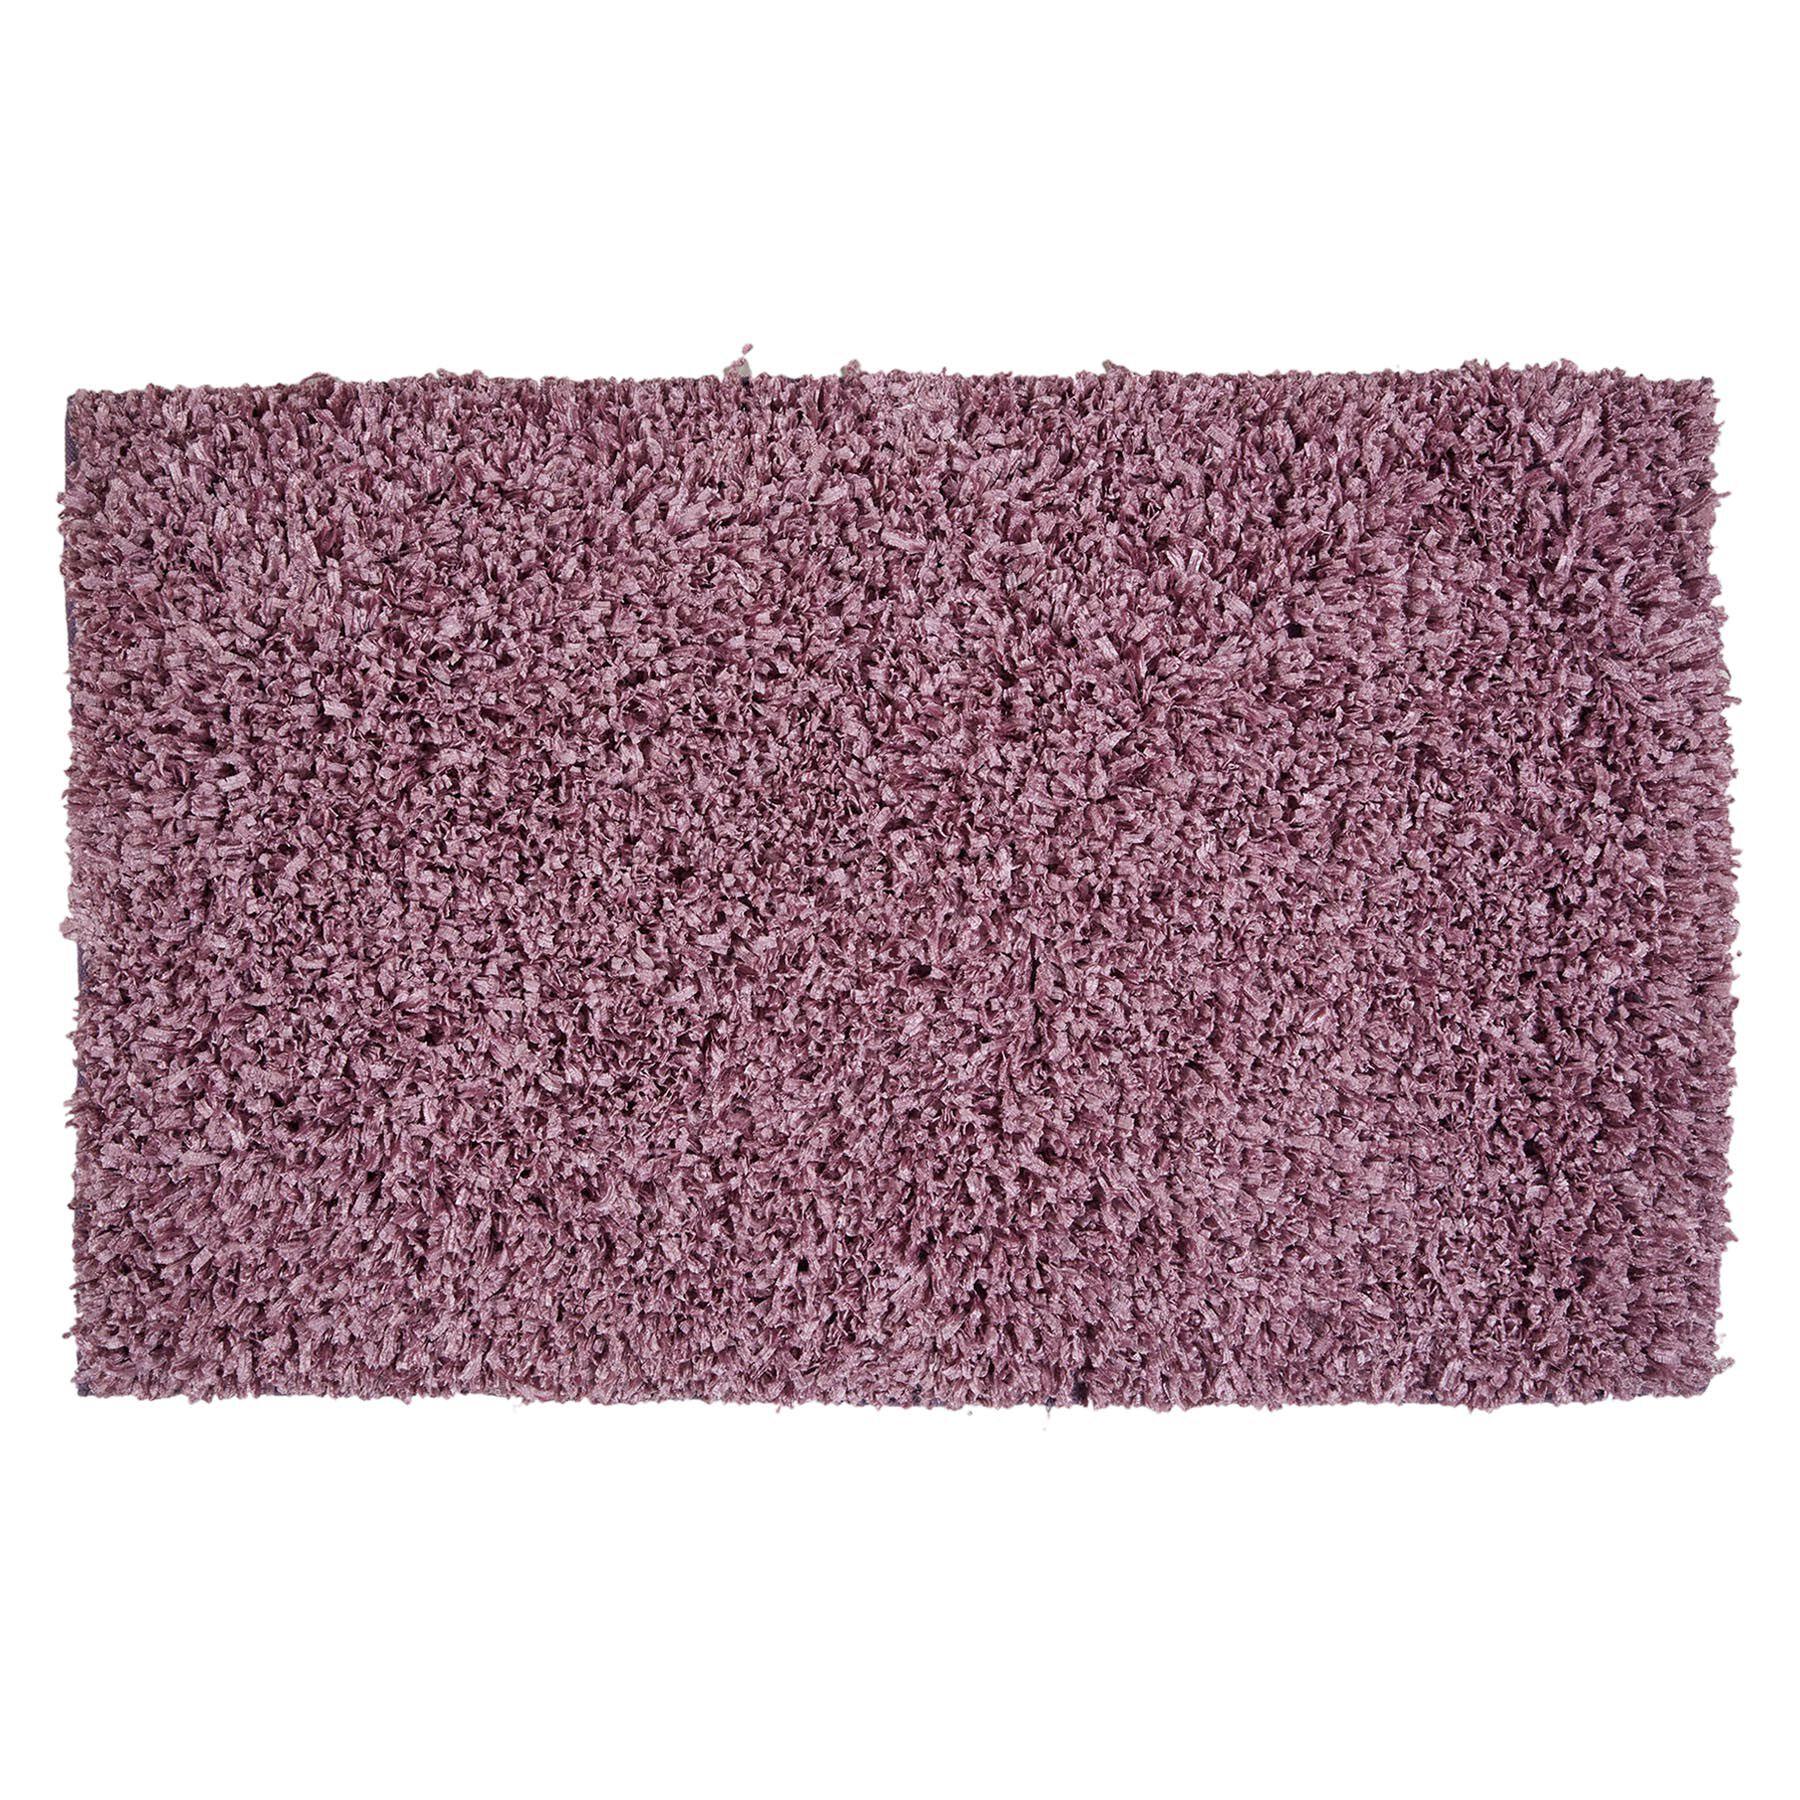 Purple Shiny Fur Shag Rug 3 X 5 Ft